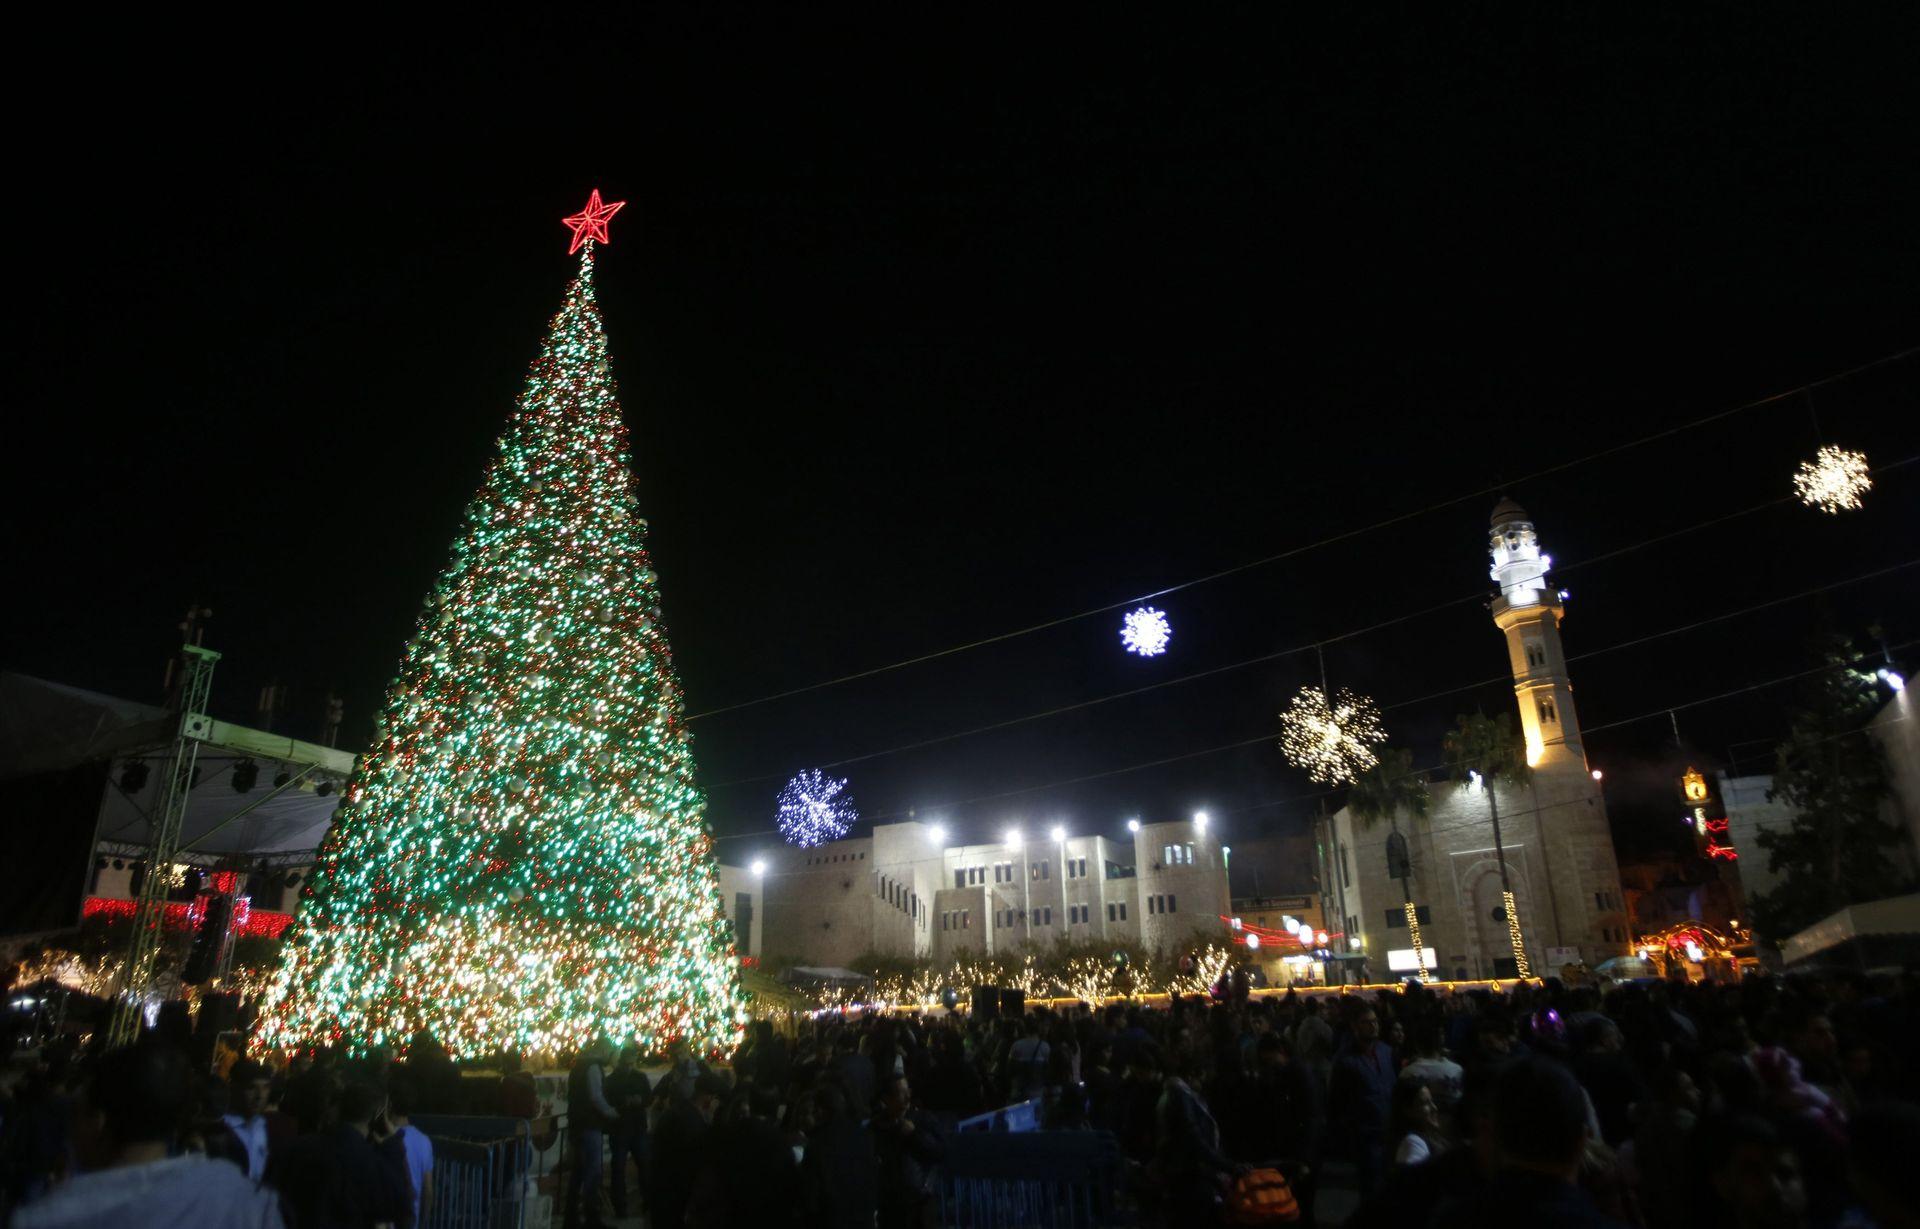 WATCH: Christmas tree lighting in Bethlehem - Video - Haaretz.com